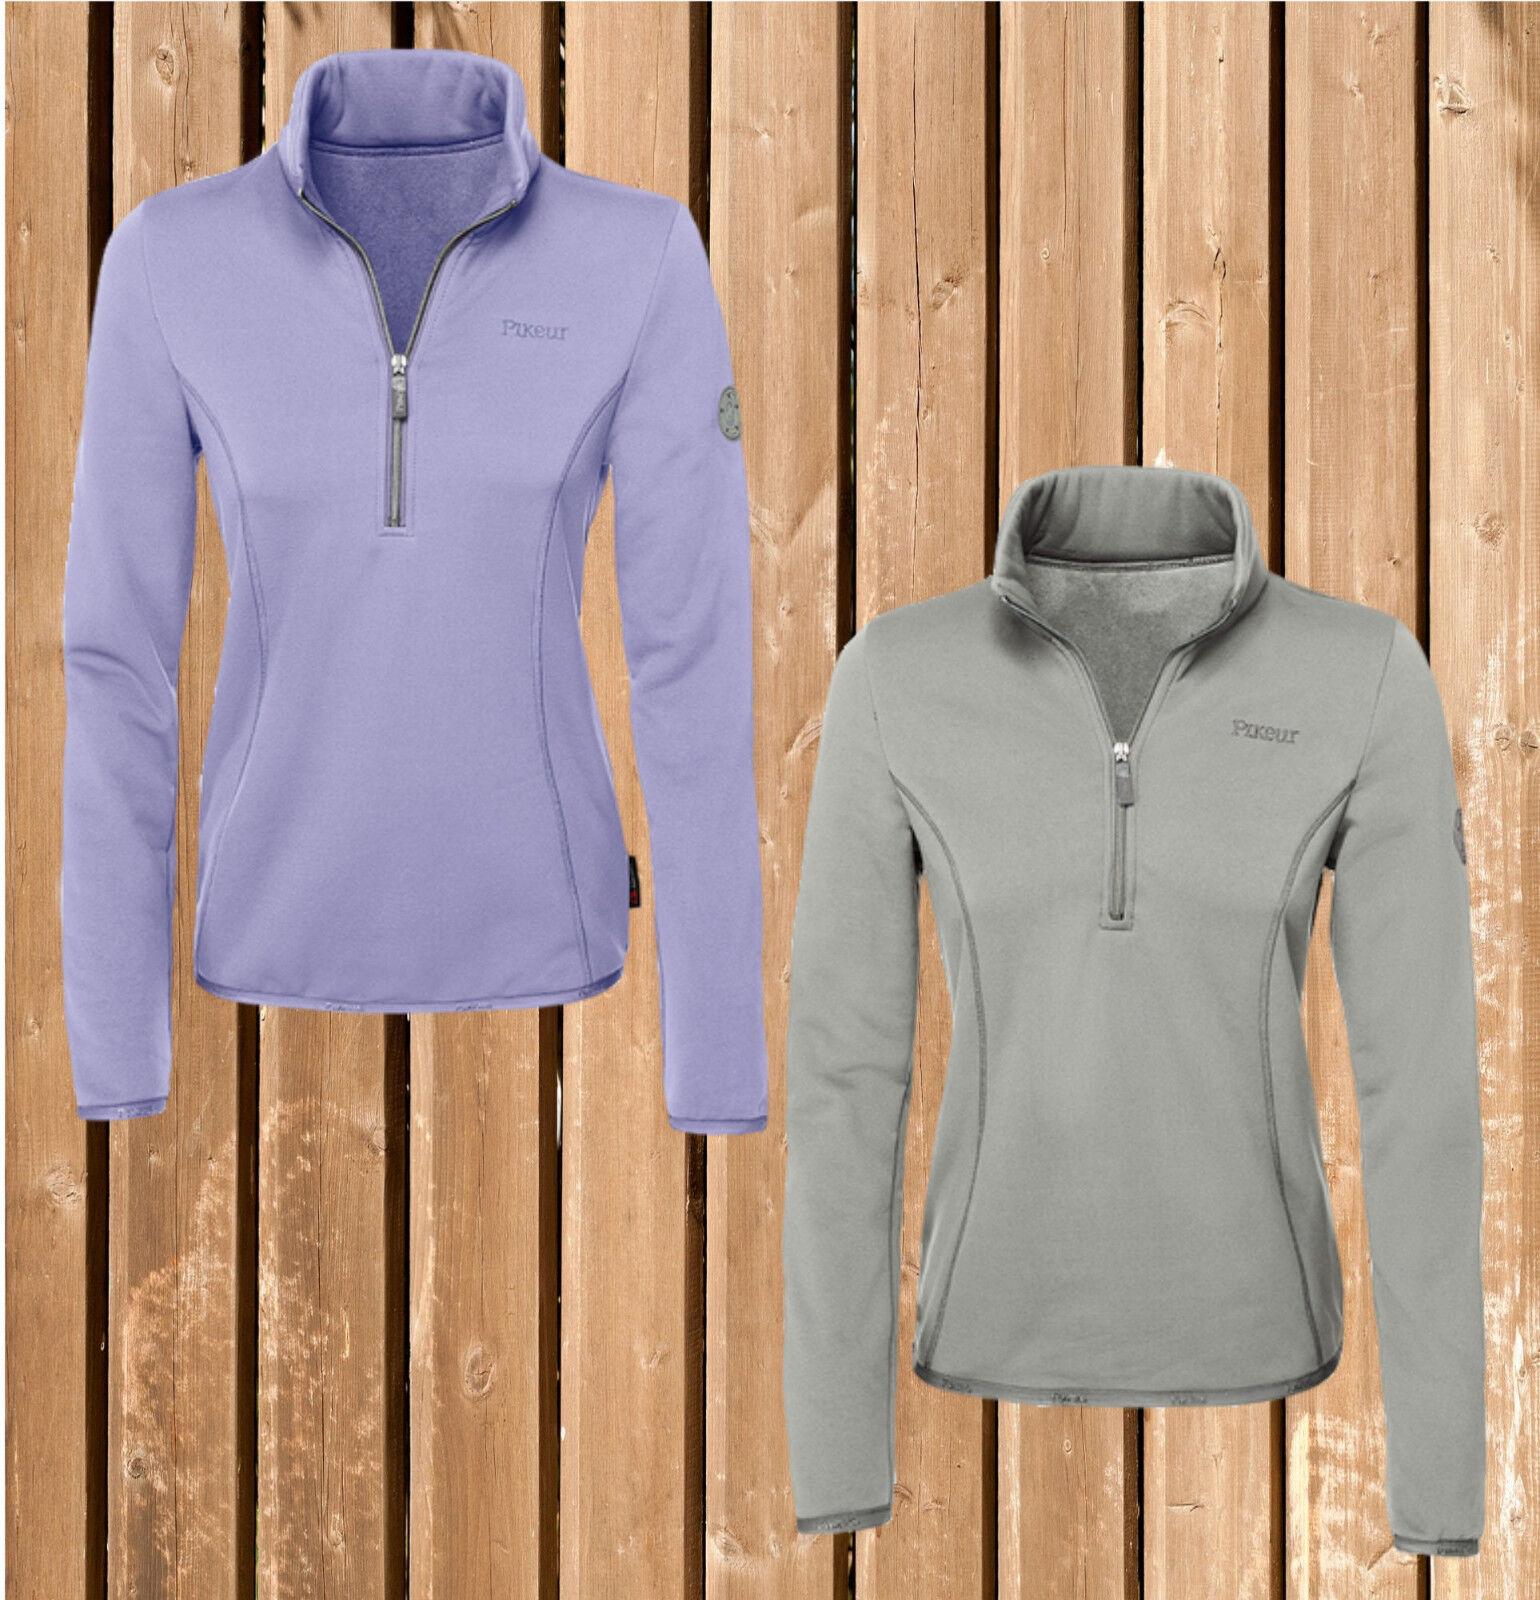 Pikeur Funktions Shirt SISKA, Polartec Pulli, Pikeur Fleece Pulli Siska    Deutschland Store    Günstige Preise    Charmantes Design